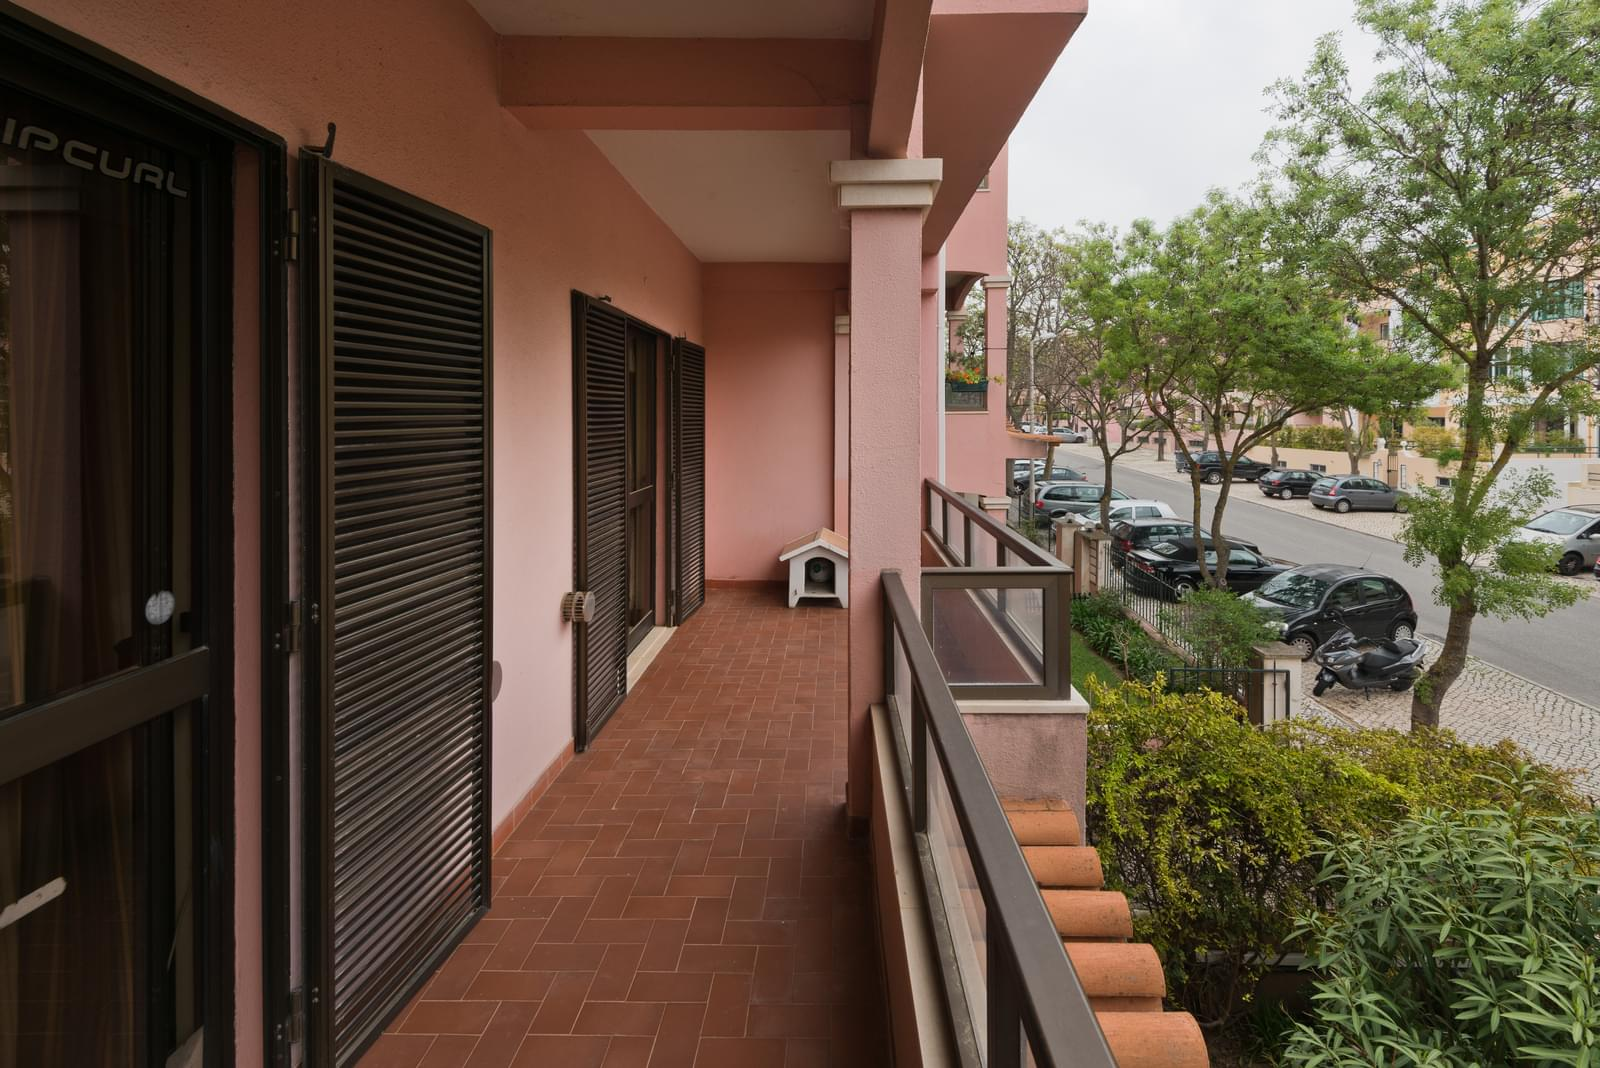 pf16968-apartamento-t3-cascais-19362b80-f27b-4384-9acd-9551fb937764